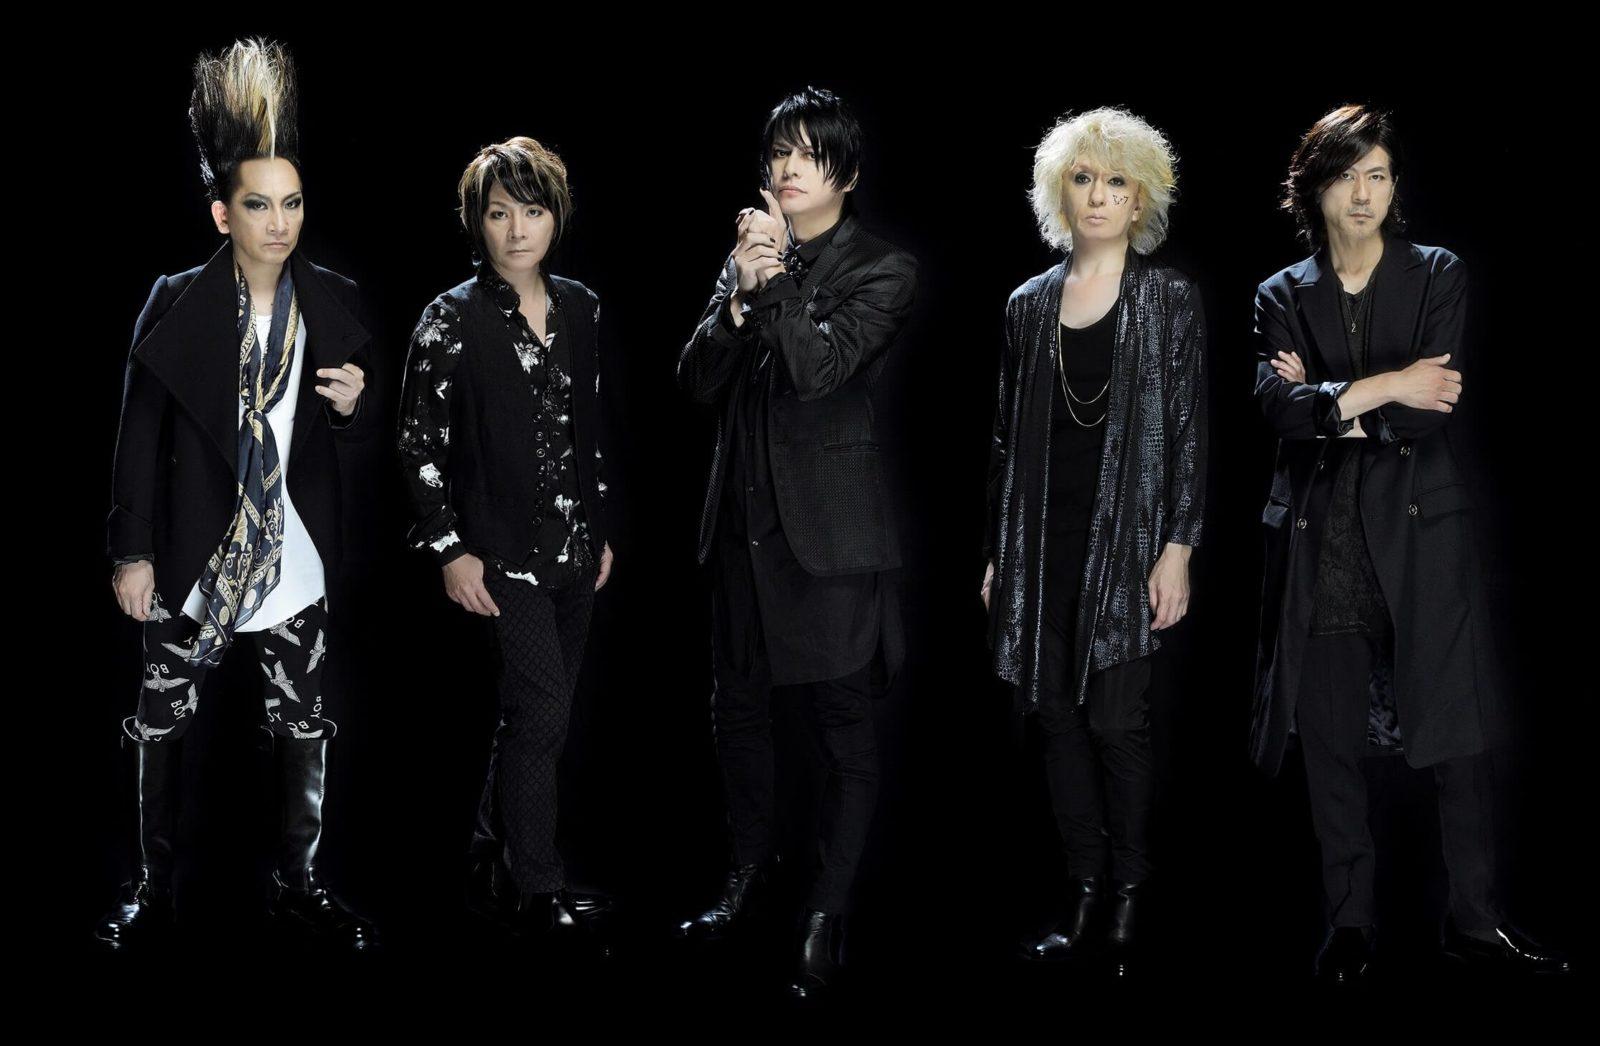 BUCK-TICK、ニューシングル『堕天使』 来年1月29日にリリース決定サムネイル画像